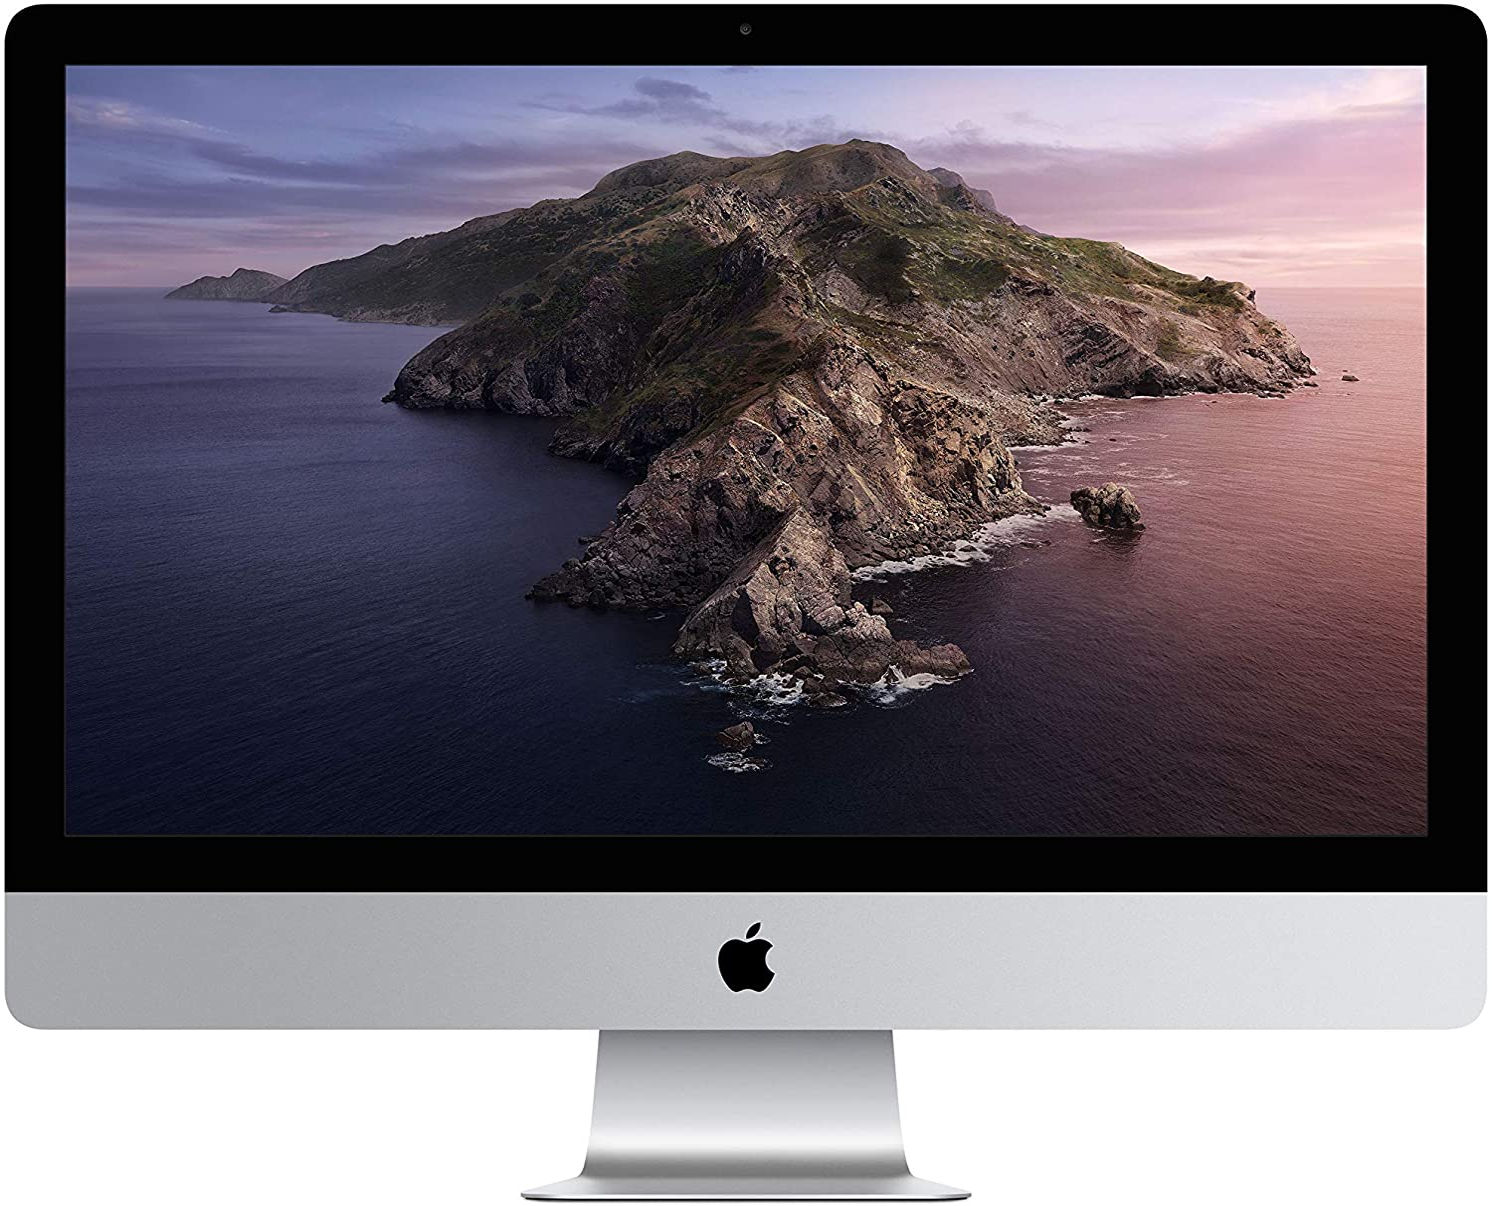 main images کامپیوتر همه کاره 27 اینچی اپل مدل iMac 2019 MRQY2B/A با صفحه نمایش 5K رتینا Apple iMac MRQY2B/A 27-Inch Retina 5K Display, 2019 Model – 3.0Ghz 6-Core 8th Generation Intel Core i5 Processor, 8GB Ram, 1TB Fusion Drive, Radeon Pro 570X with 4GB Memory